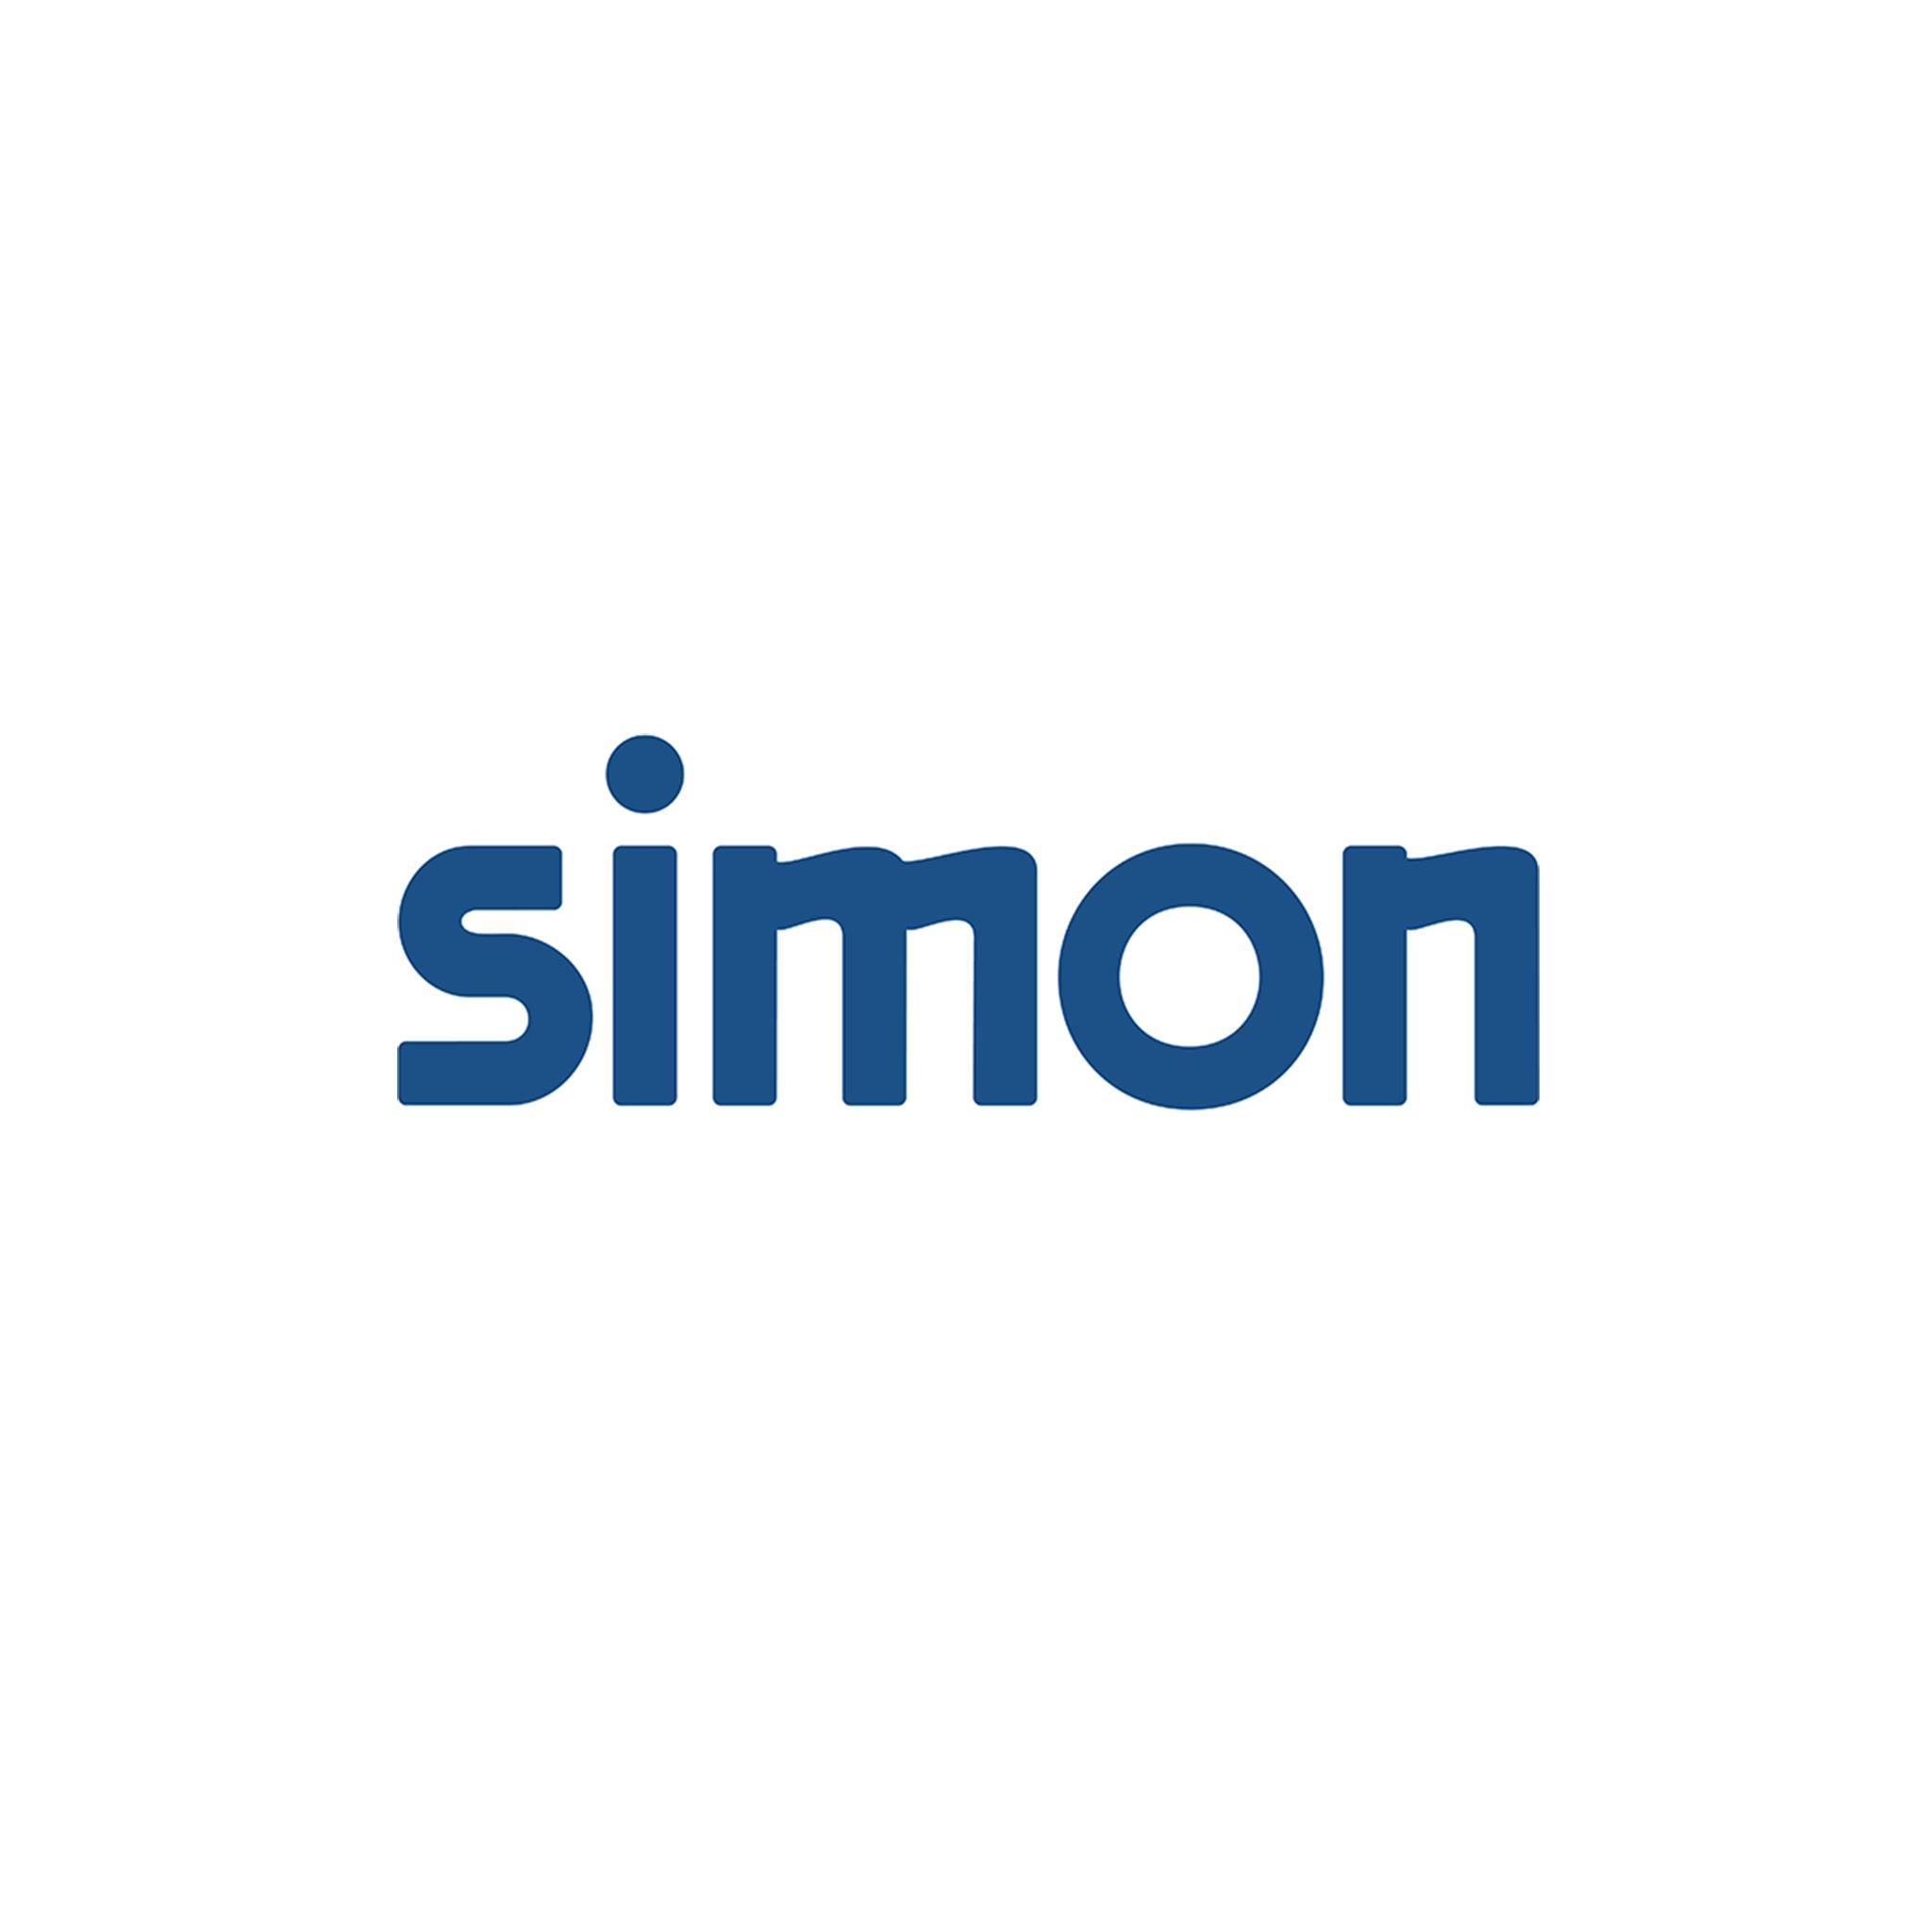 marca_simon